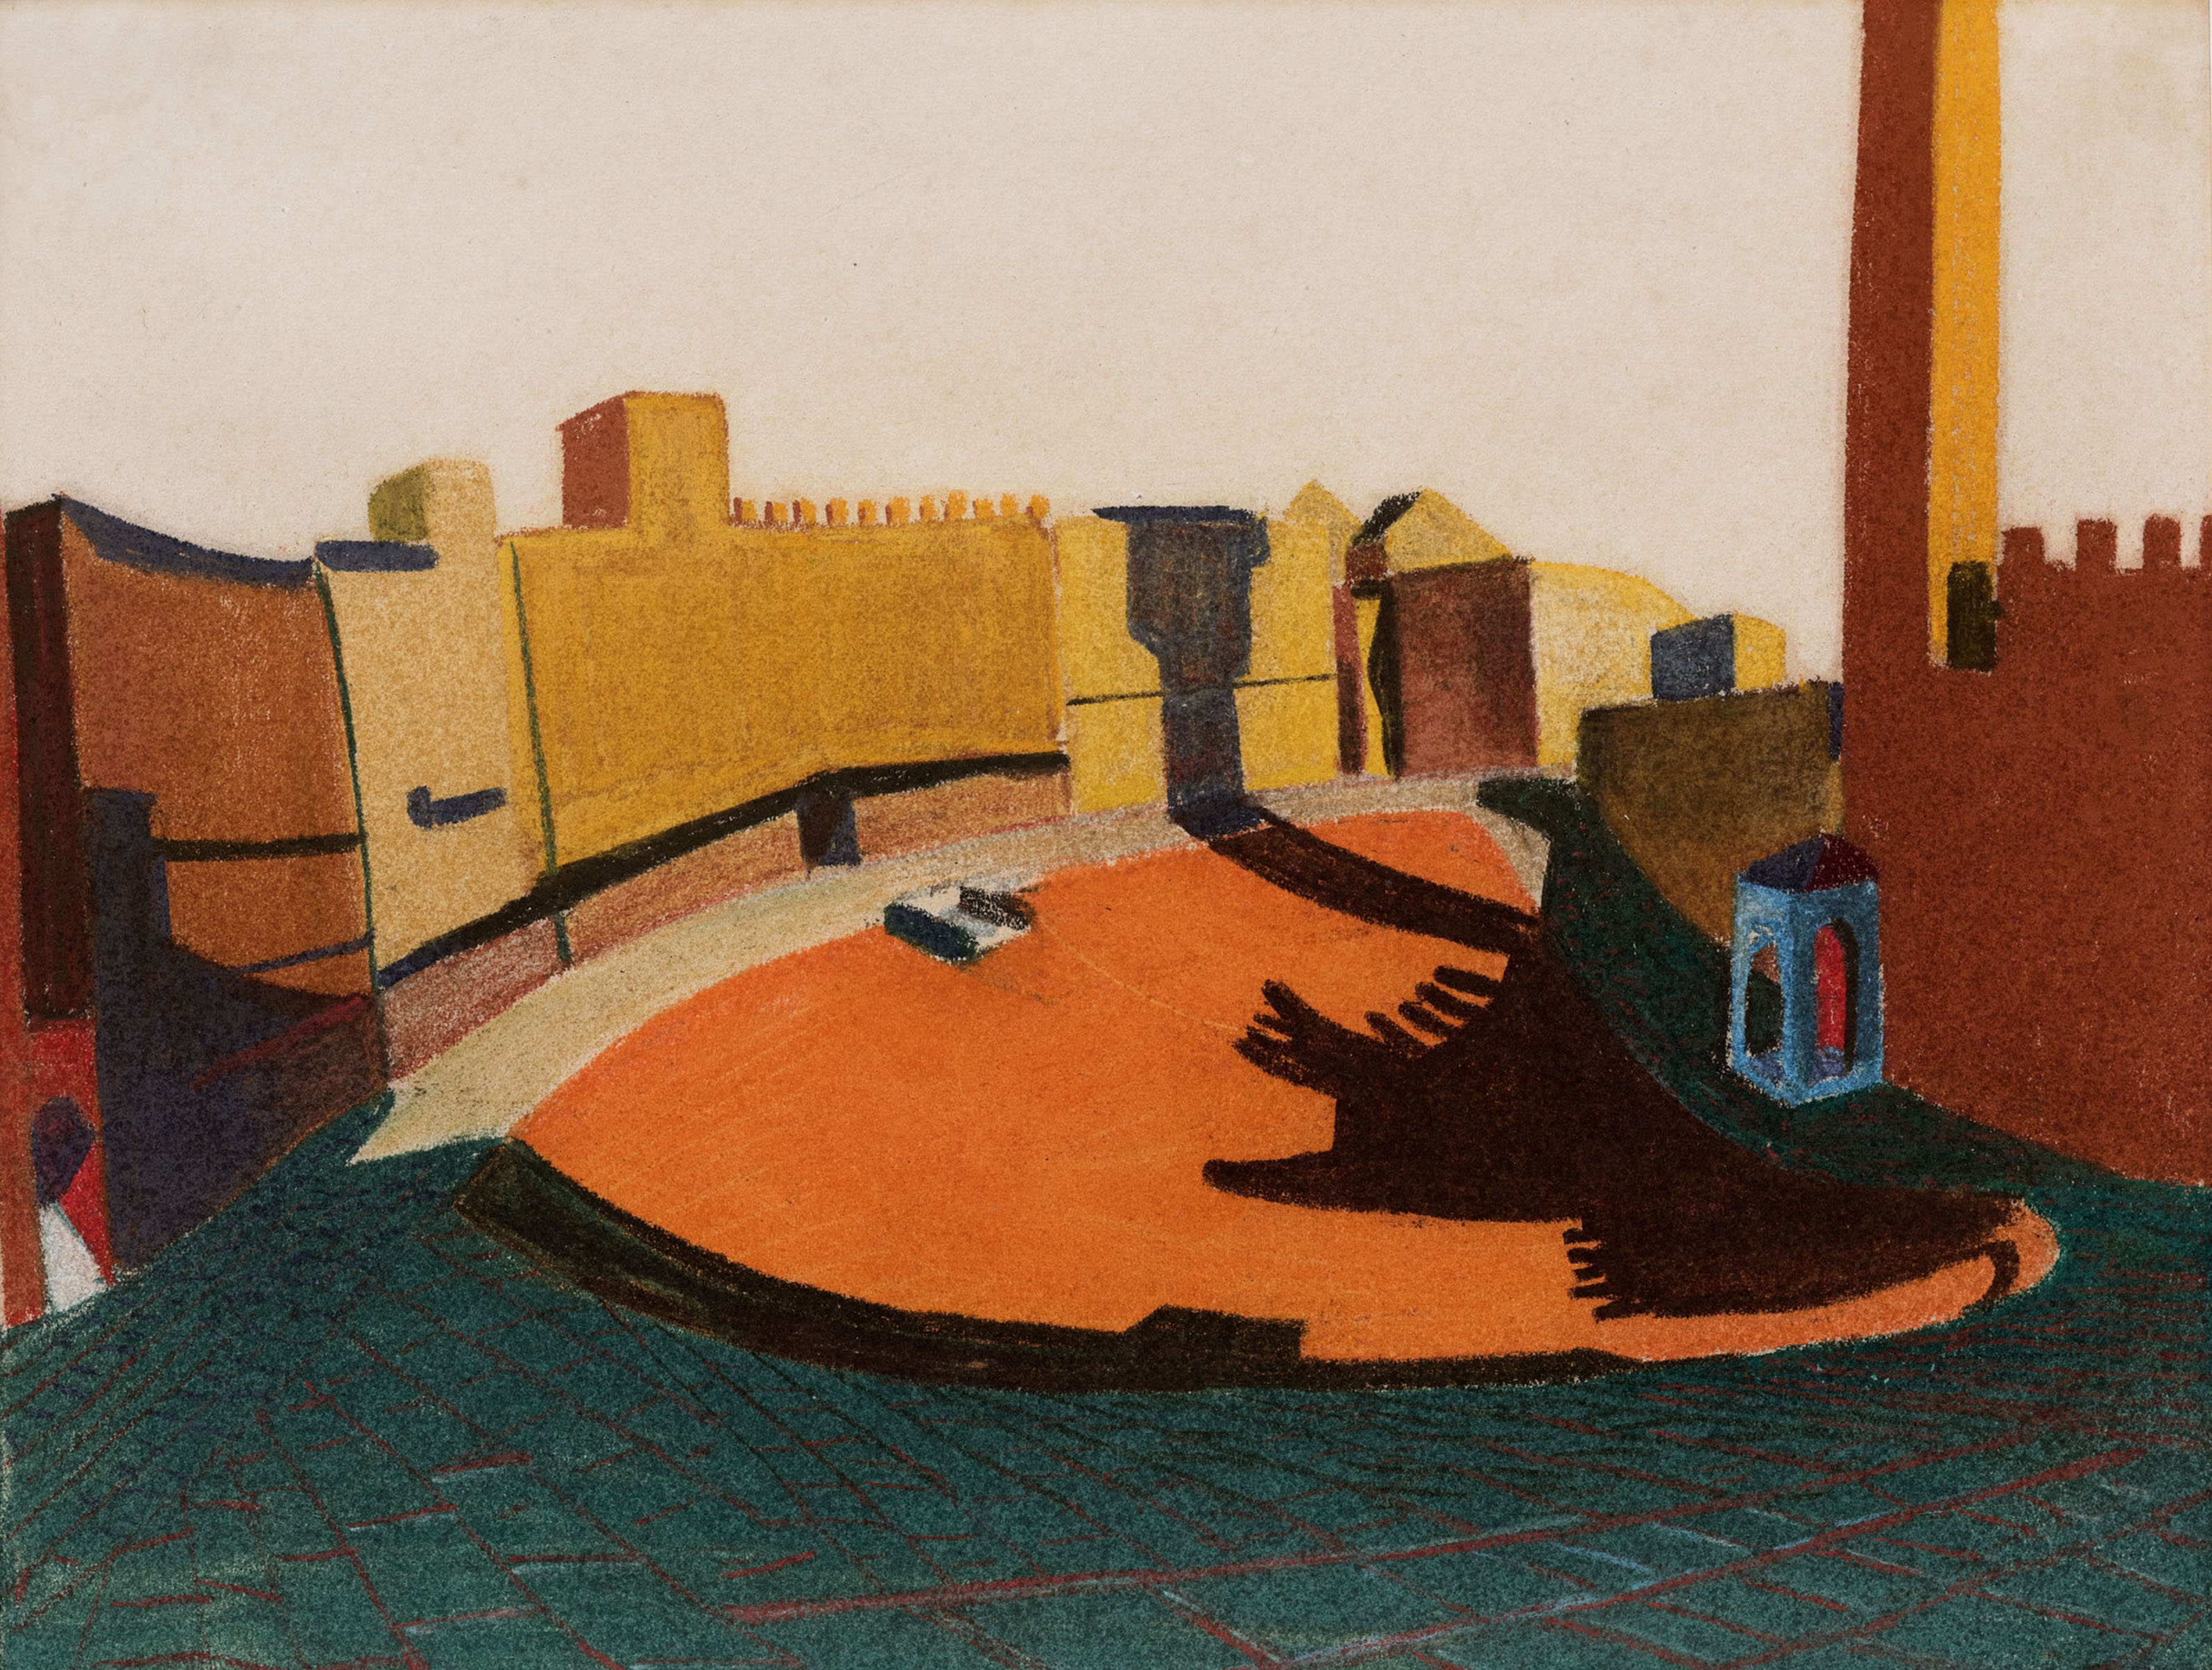 Piazza Del Campo No.2 Siena, İtalya, 1951 ‒ Kağıt üzerine pastel, Nathaniel Kahn Koleksiyonu